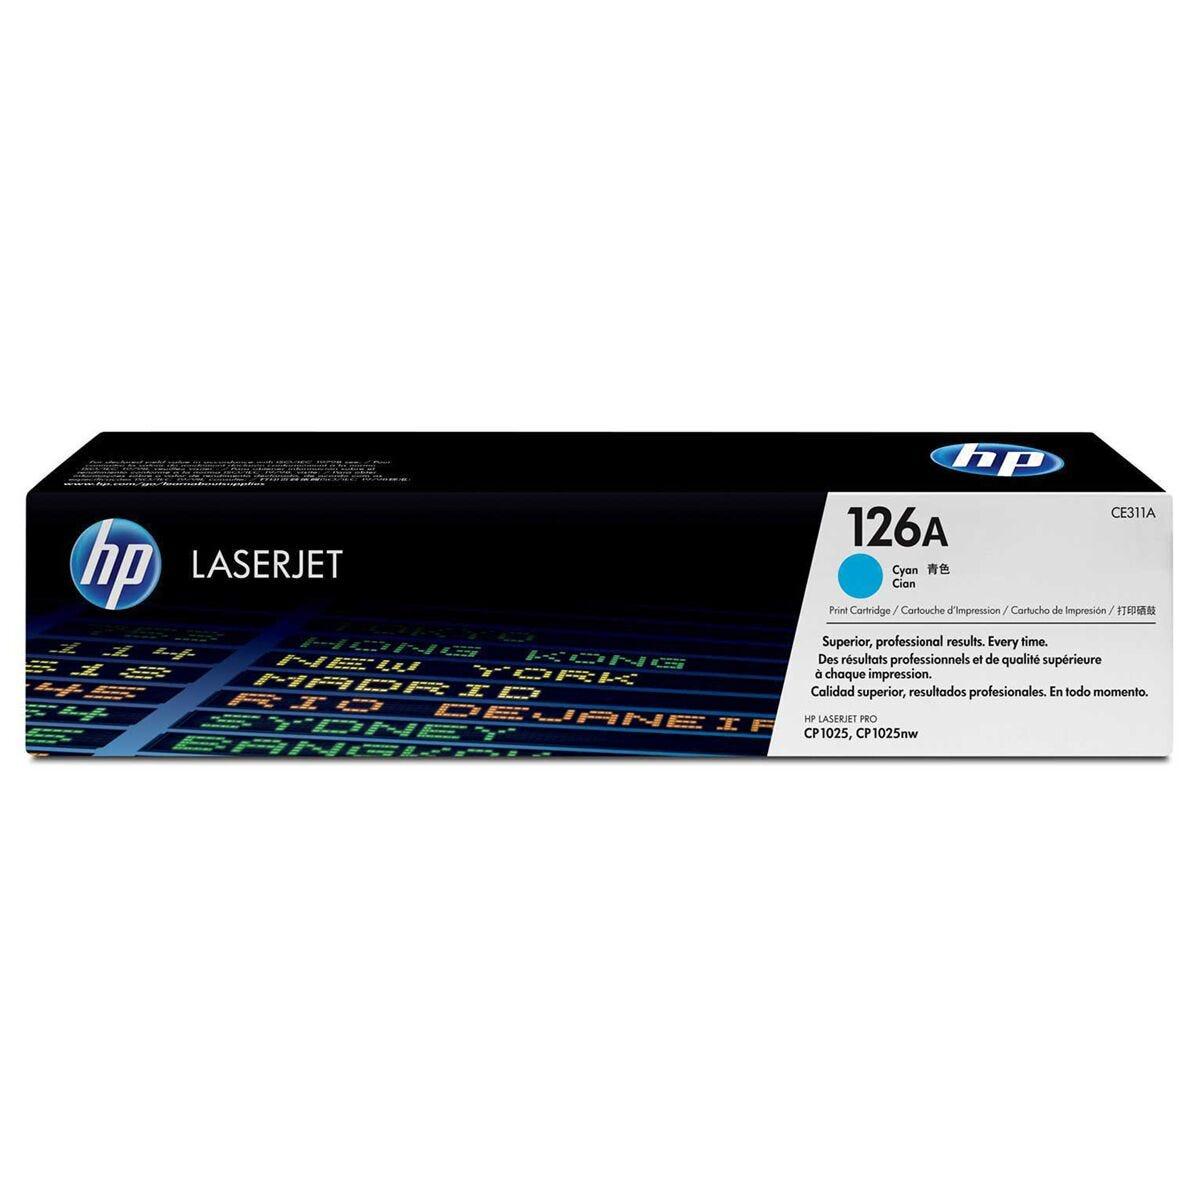 HP Colour 126A Printer Ink Toner Cartridge Cyan